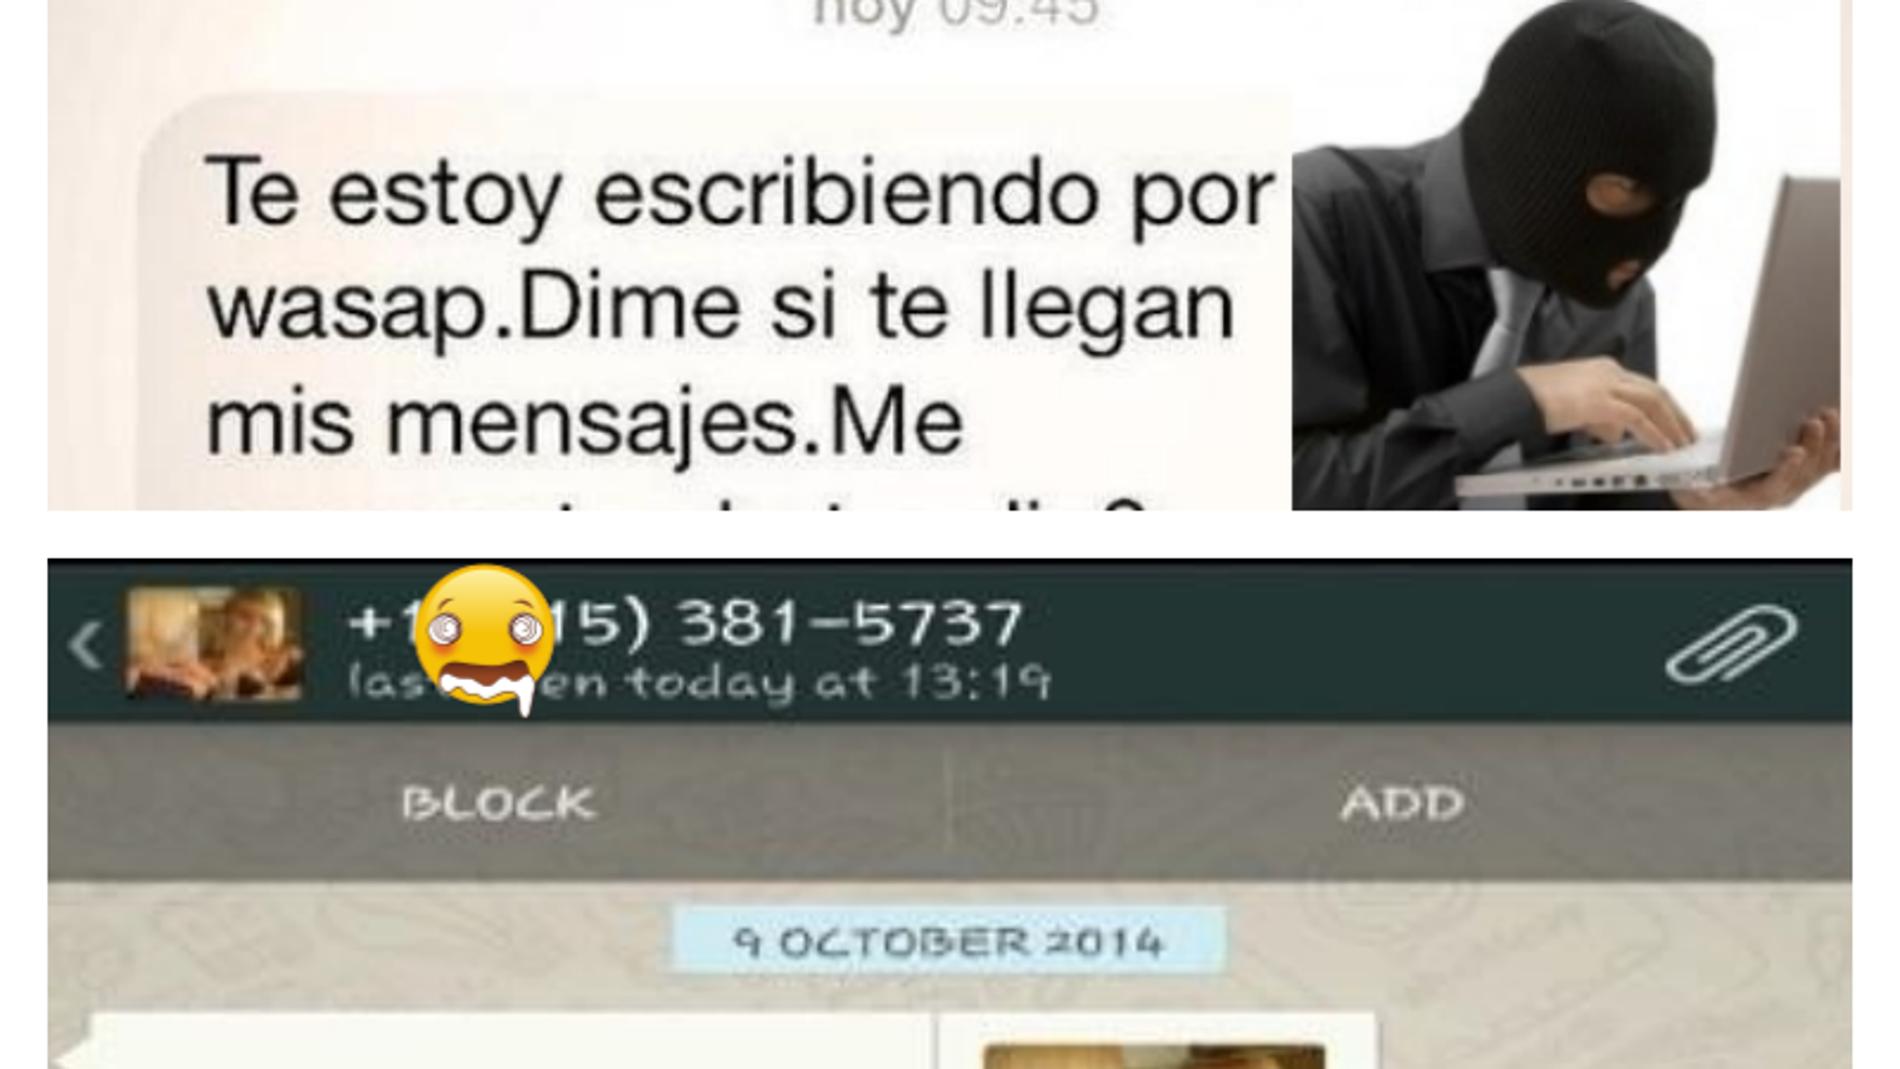 Mensajes fraudulentos en Whatsapp